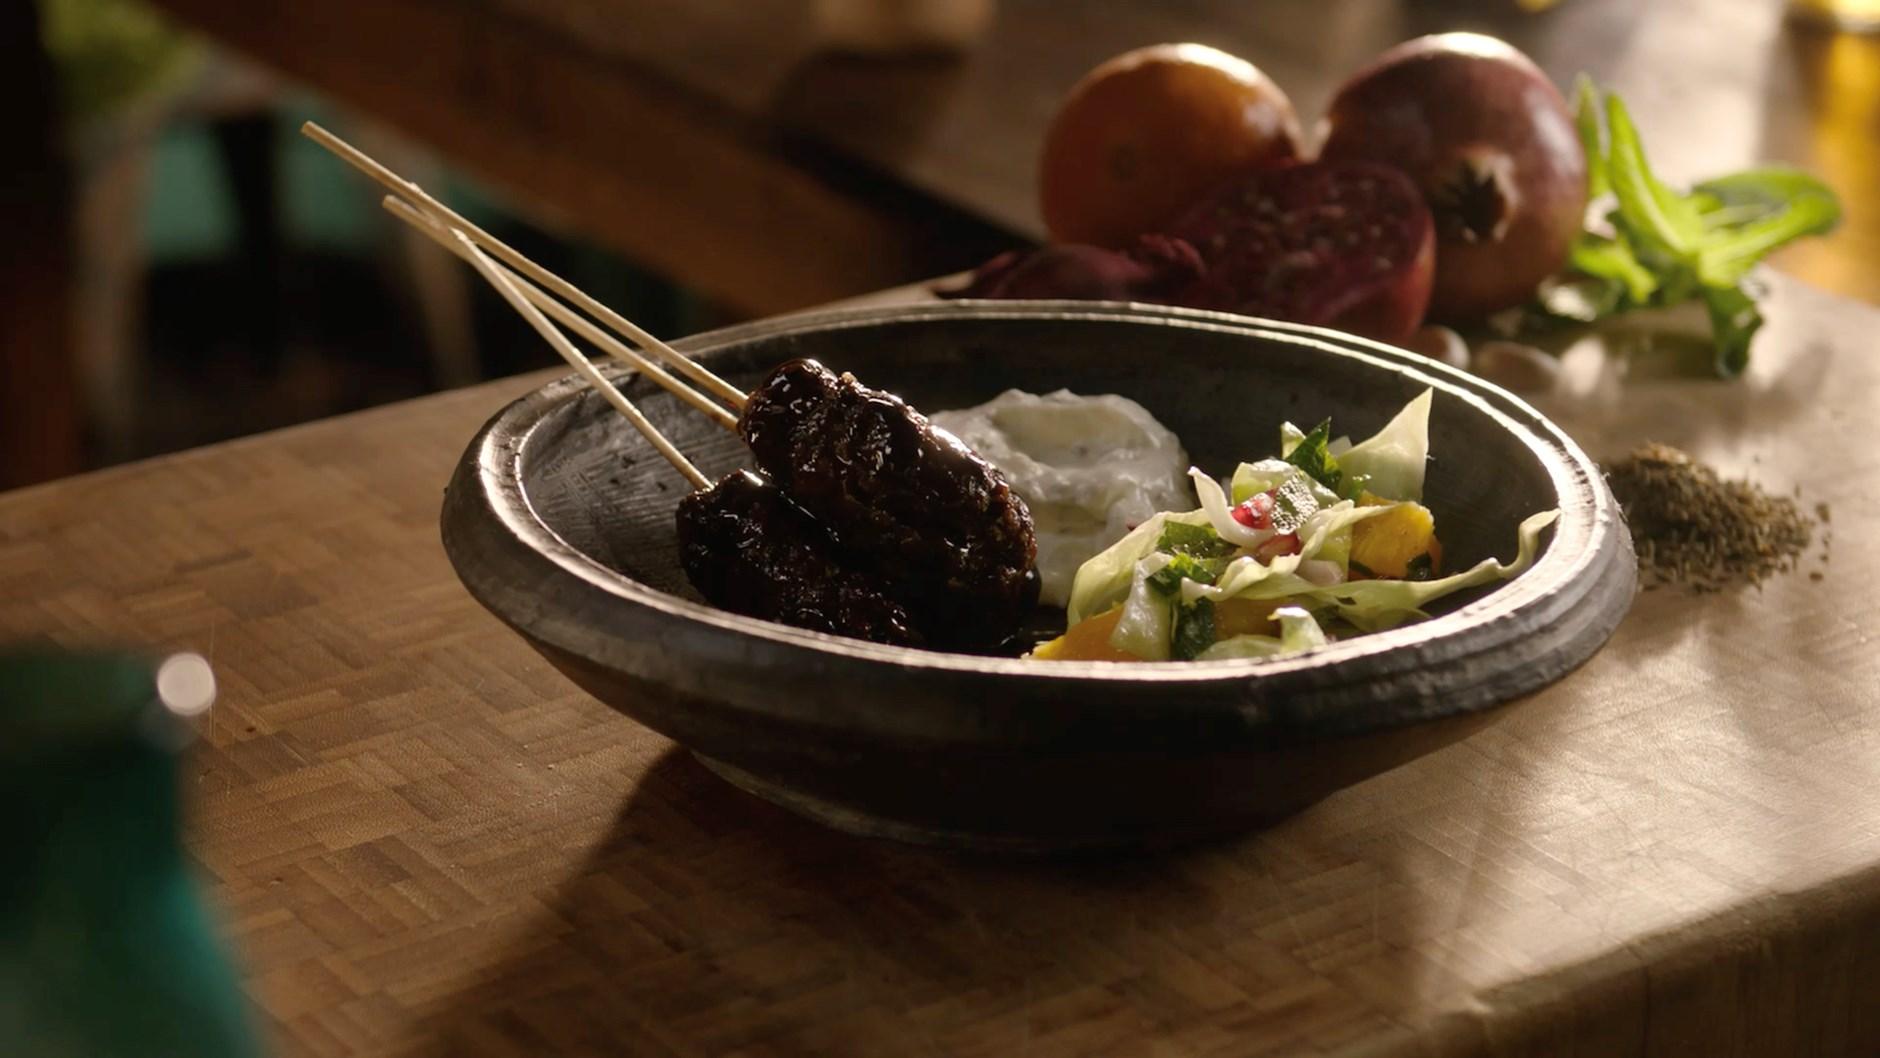 Beef Kebab With Yogurt And Cabbage Lurpak